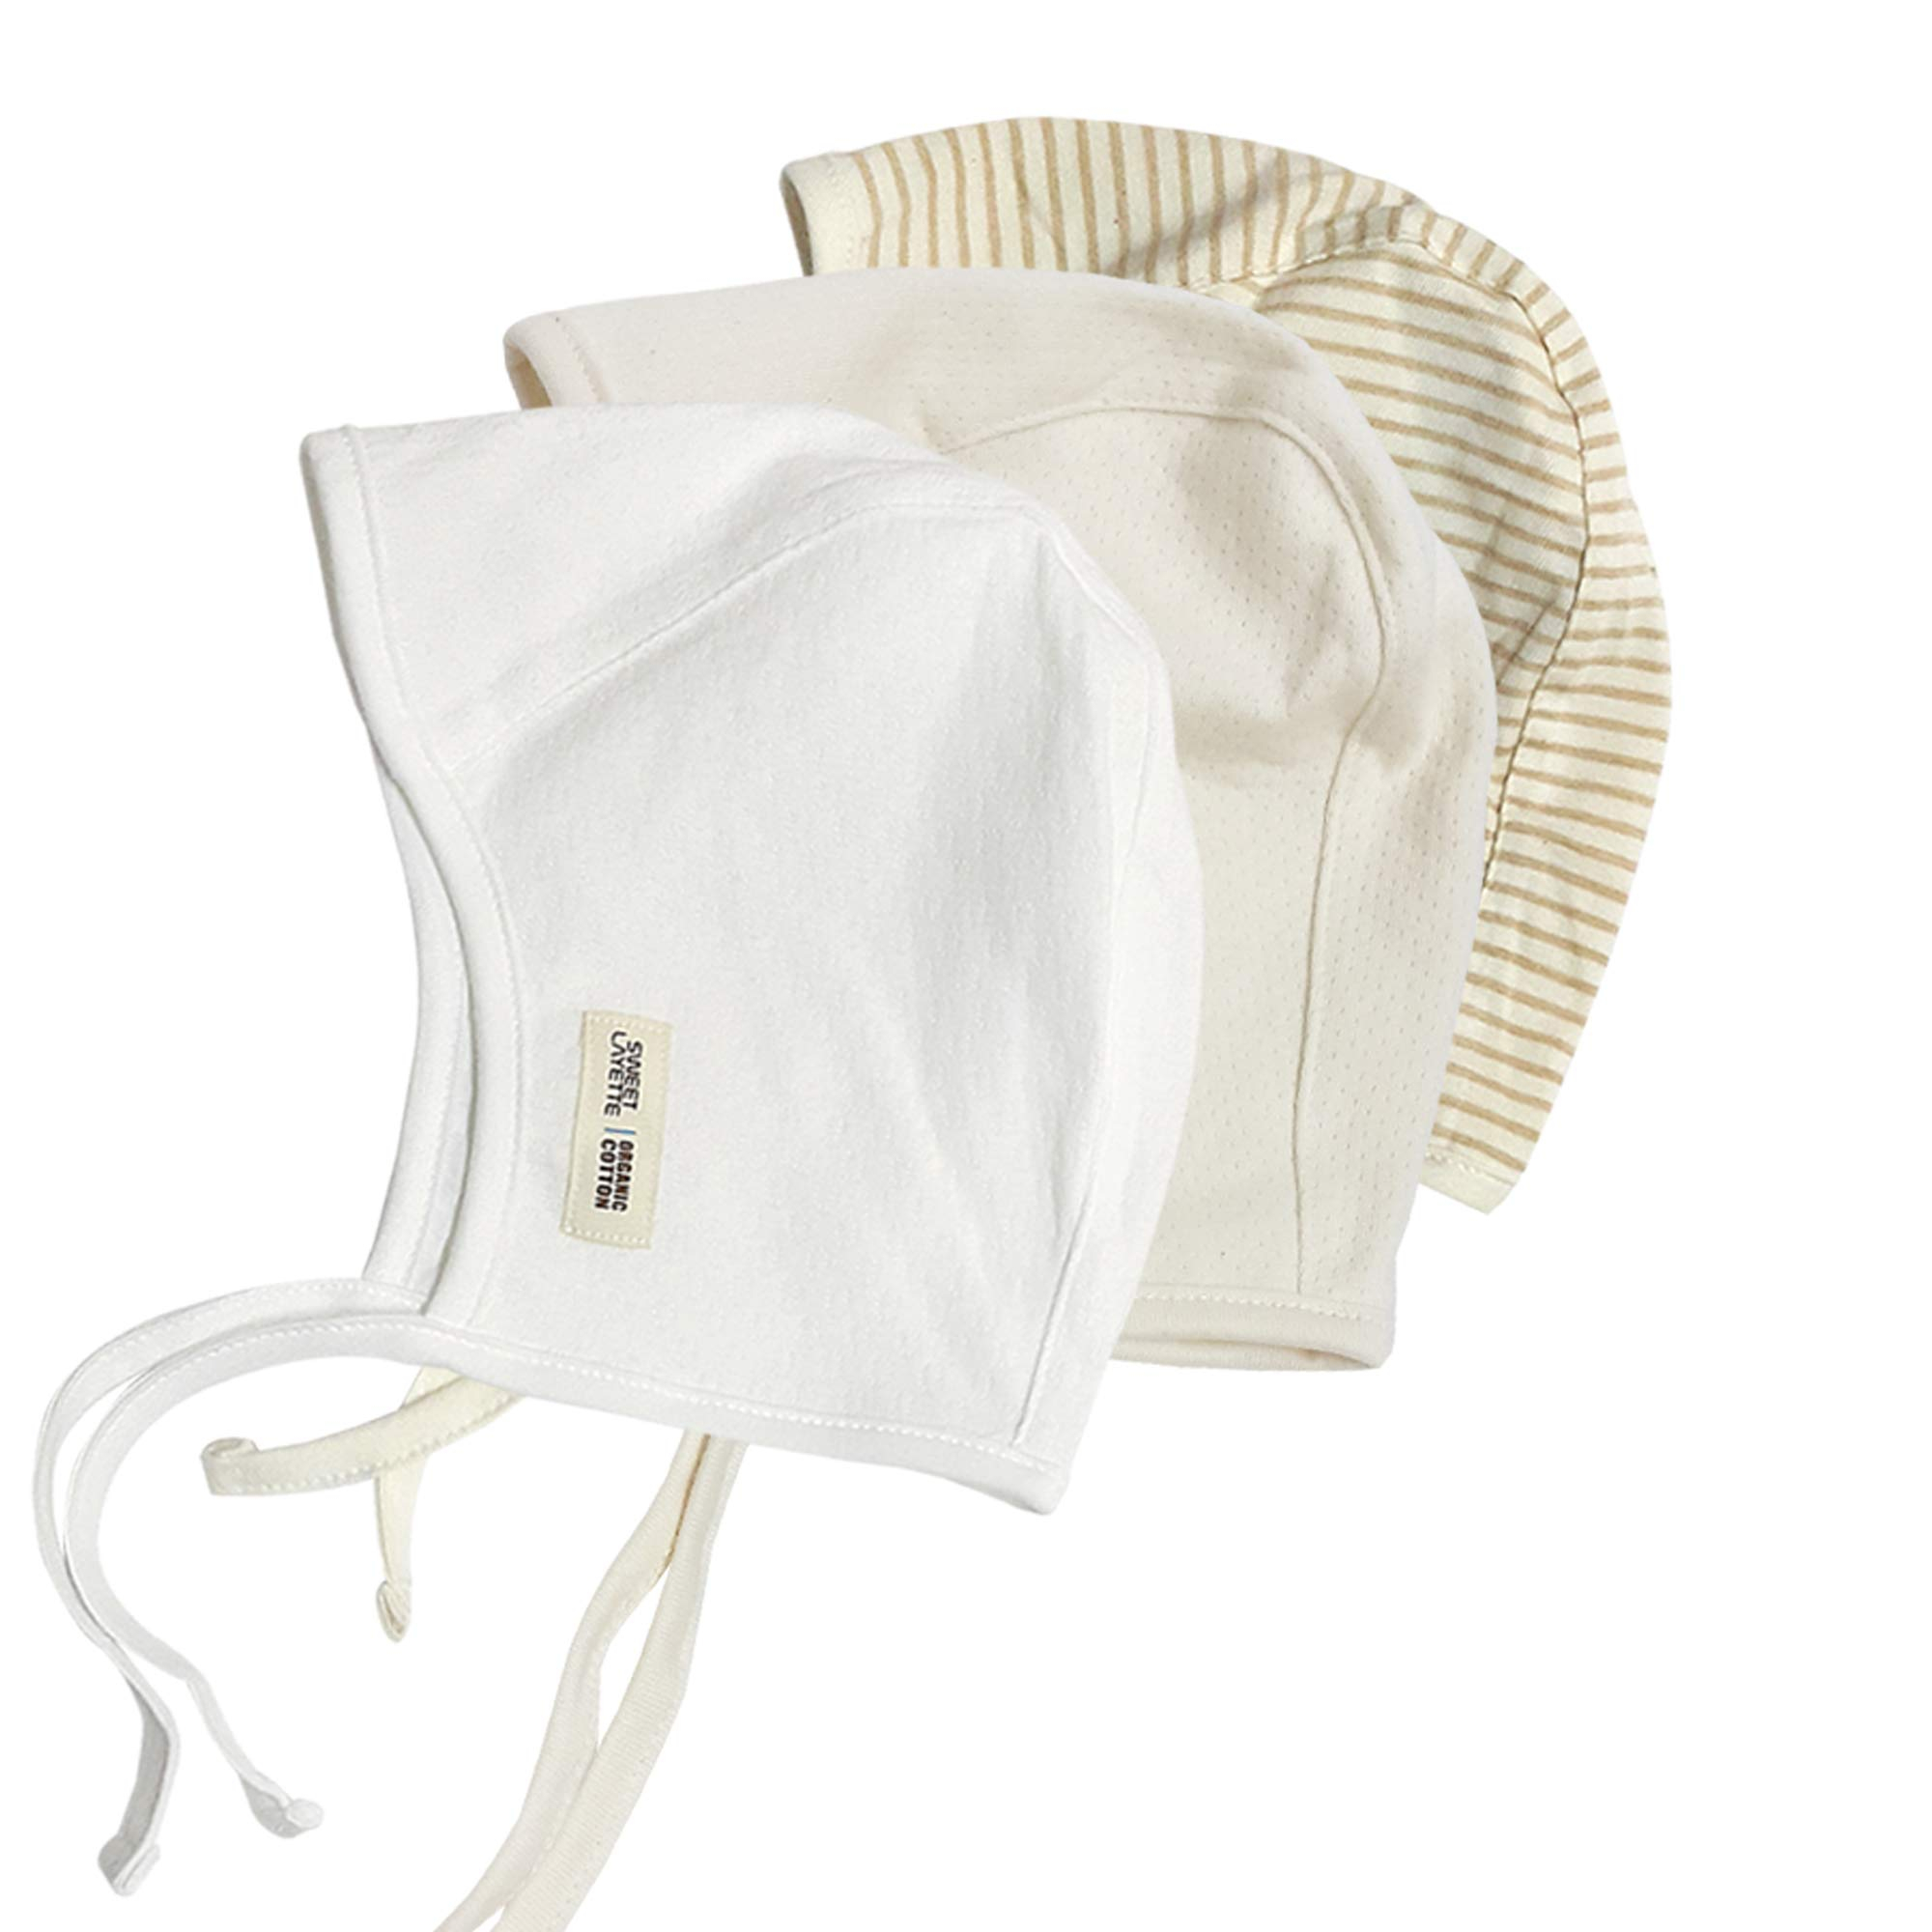 Sweet Layette Baby Bonnet Cap - Baby Pilot Hat - 100% Organic Cotton (3Set (Ivory,Beige,Stripe)) by Sweet Layette